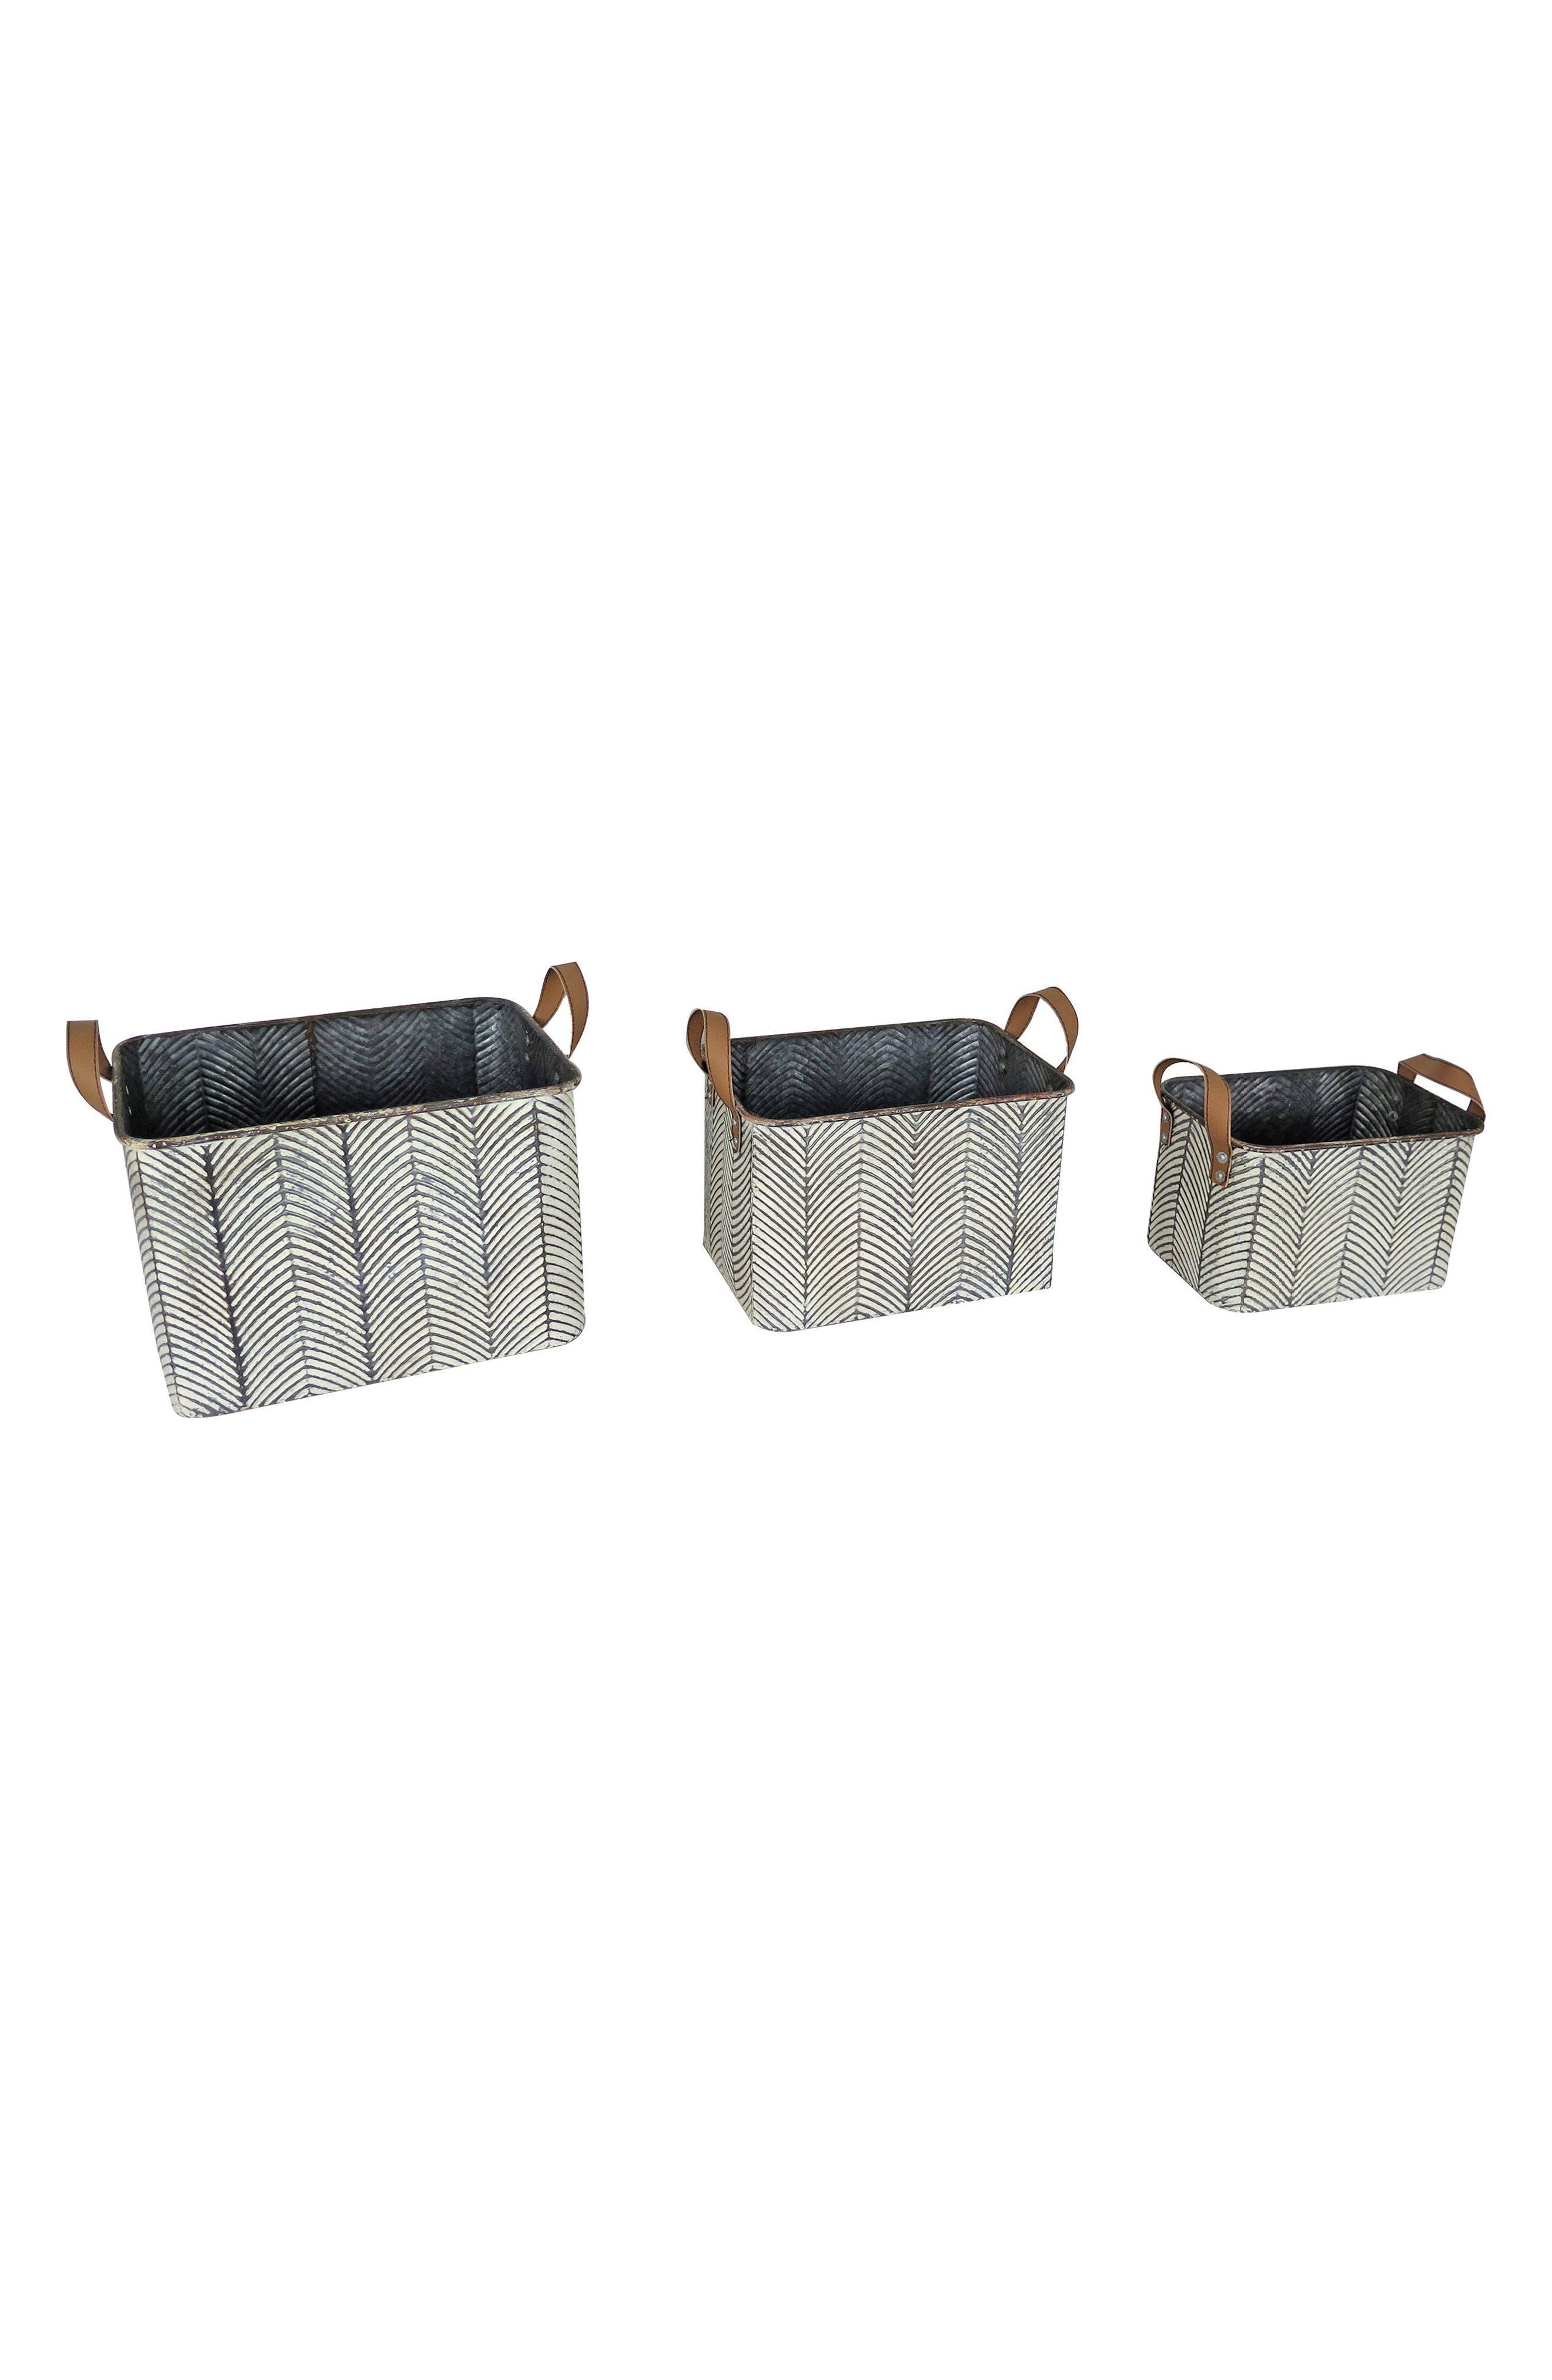 Braxton Set of 3 Baskets,                             Main thumbnail 1, color,                             Metal/ Faux Leather